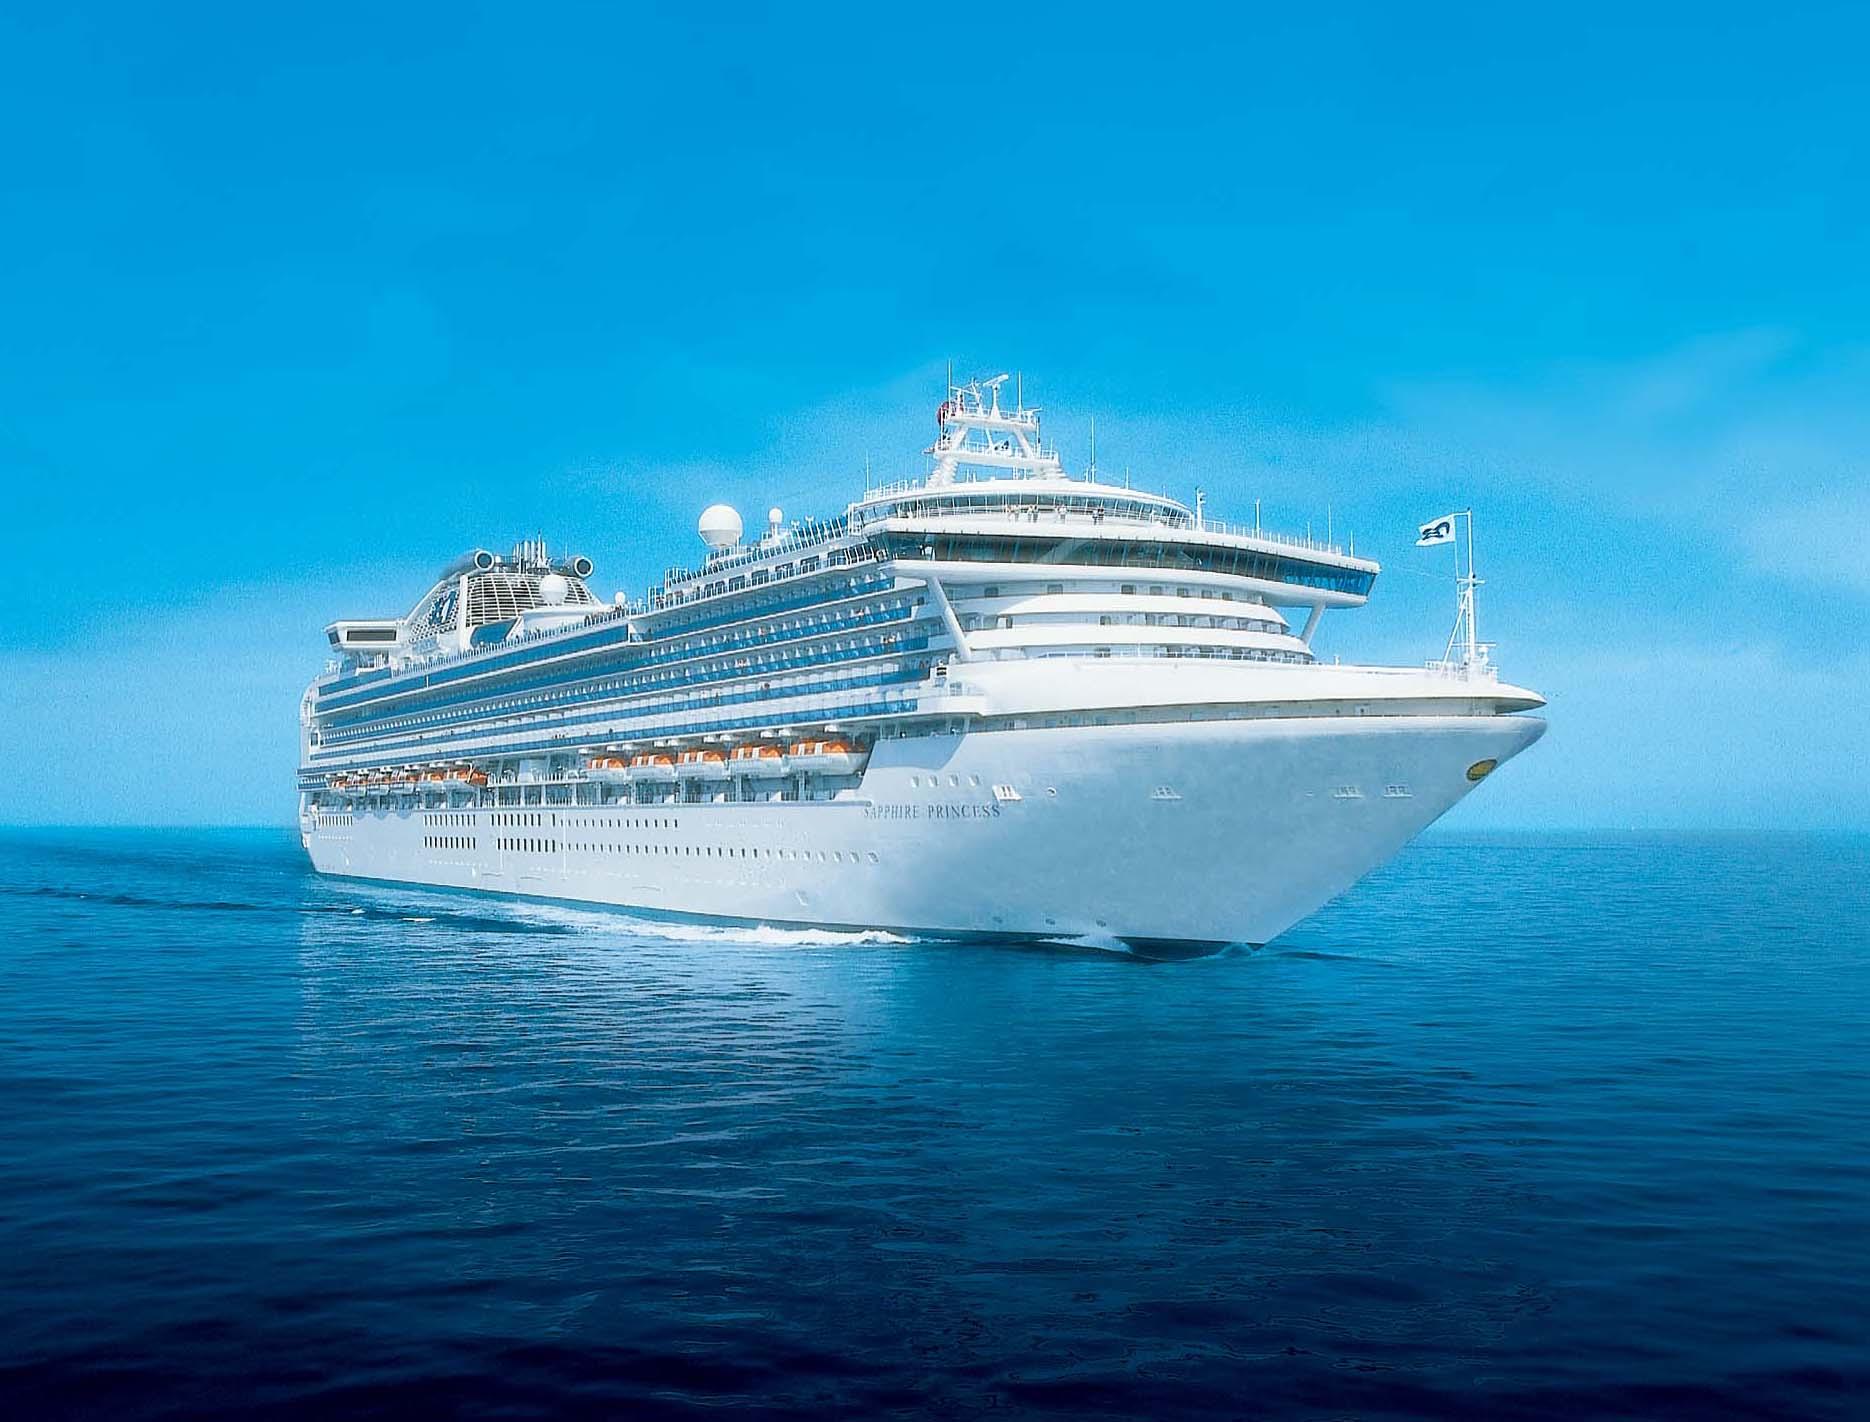 Princess Cruises Sapphire Princess cruise ship